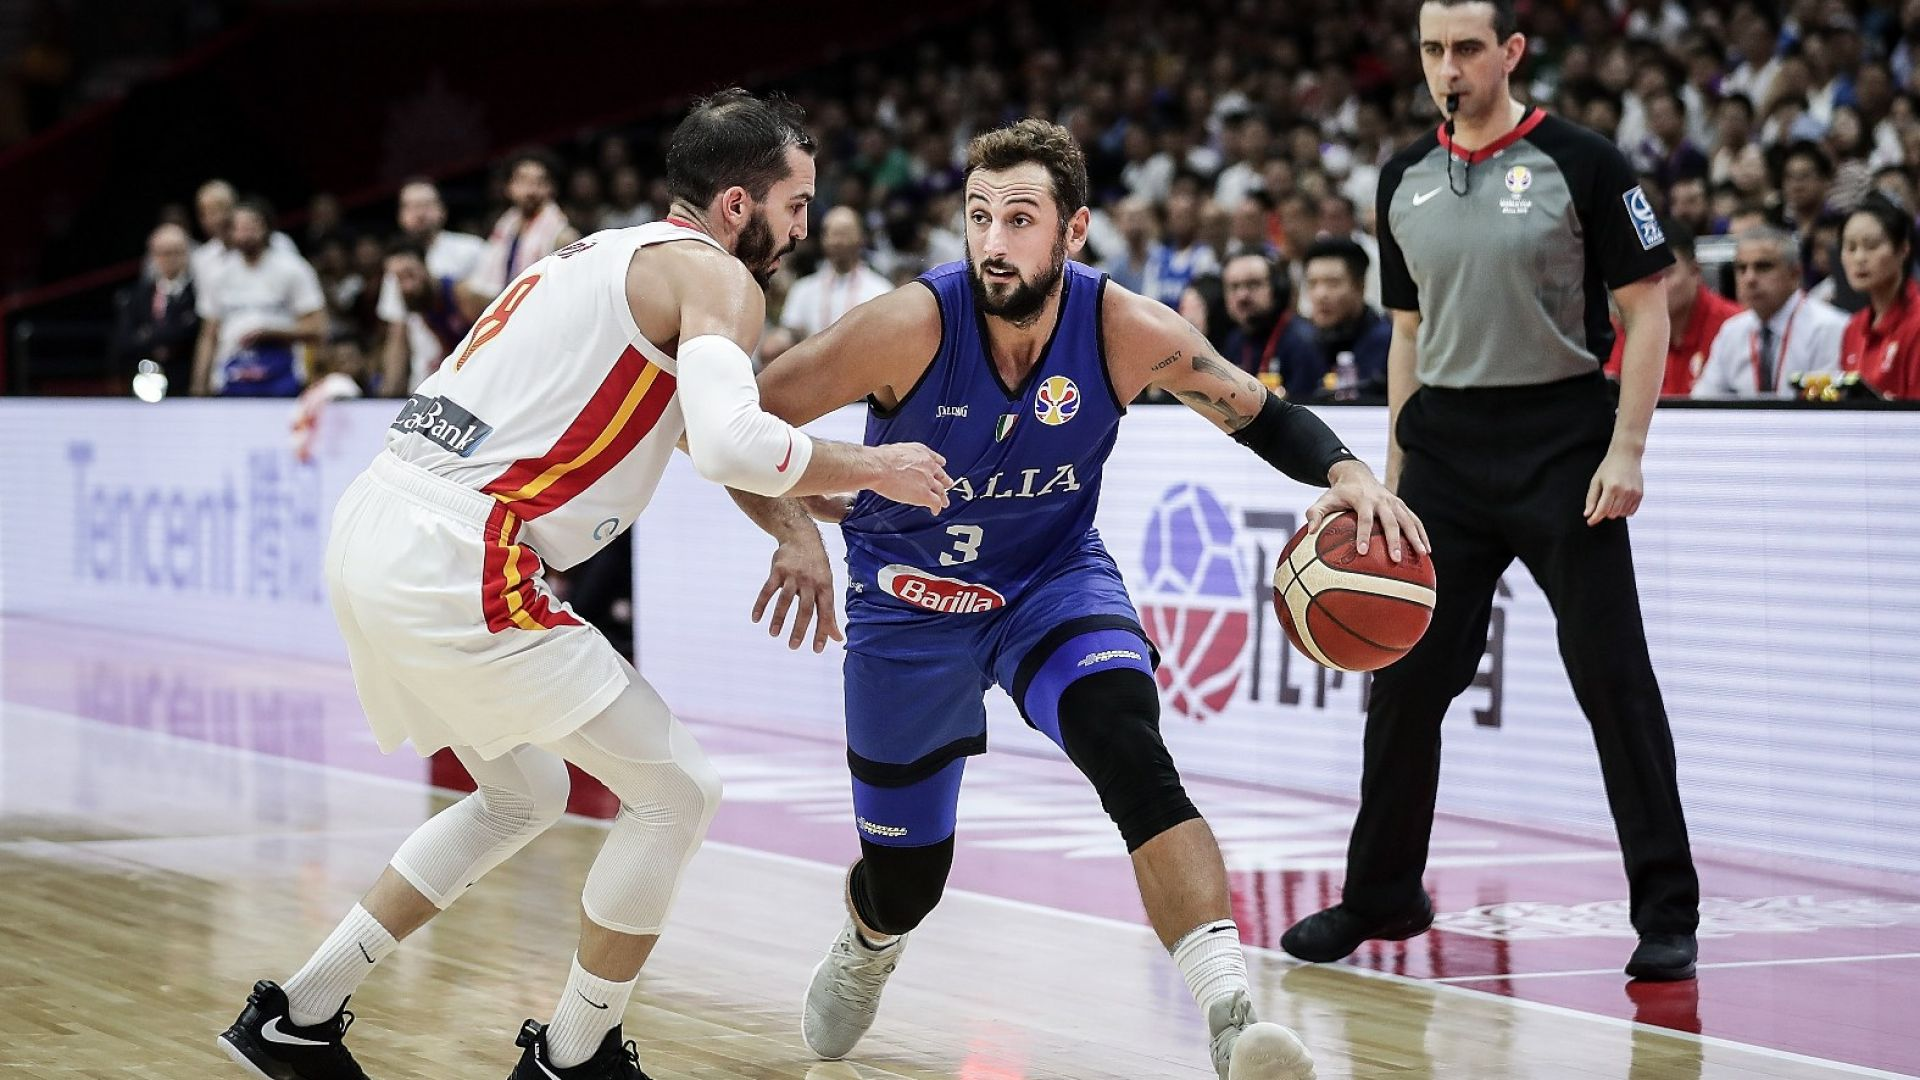 Испанците стегнаха багажа на италианците на Световното по баскетбол